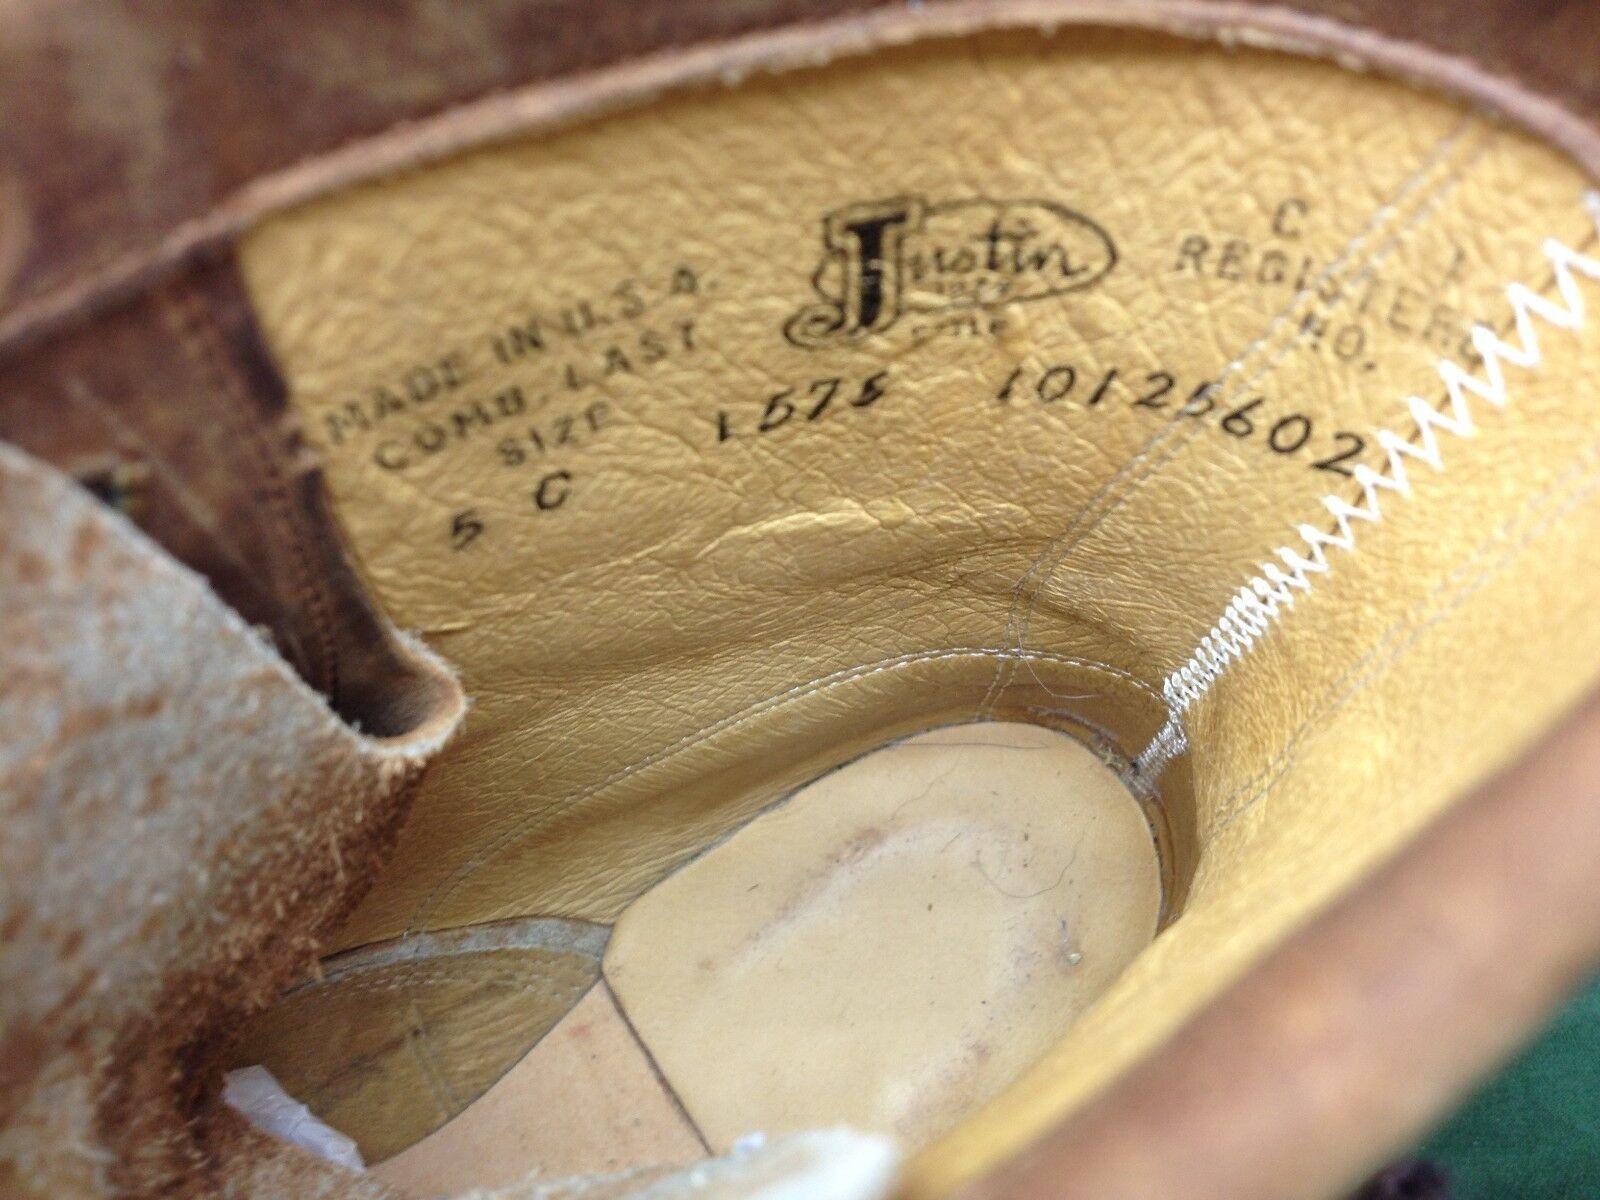 DISTRESSED JUSTIN USA 1575 GRANNY BROWN LEATHER WESTERN KILTIE GRANNY 1575 RANCH Stiefel 5C bb98f5